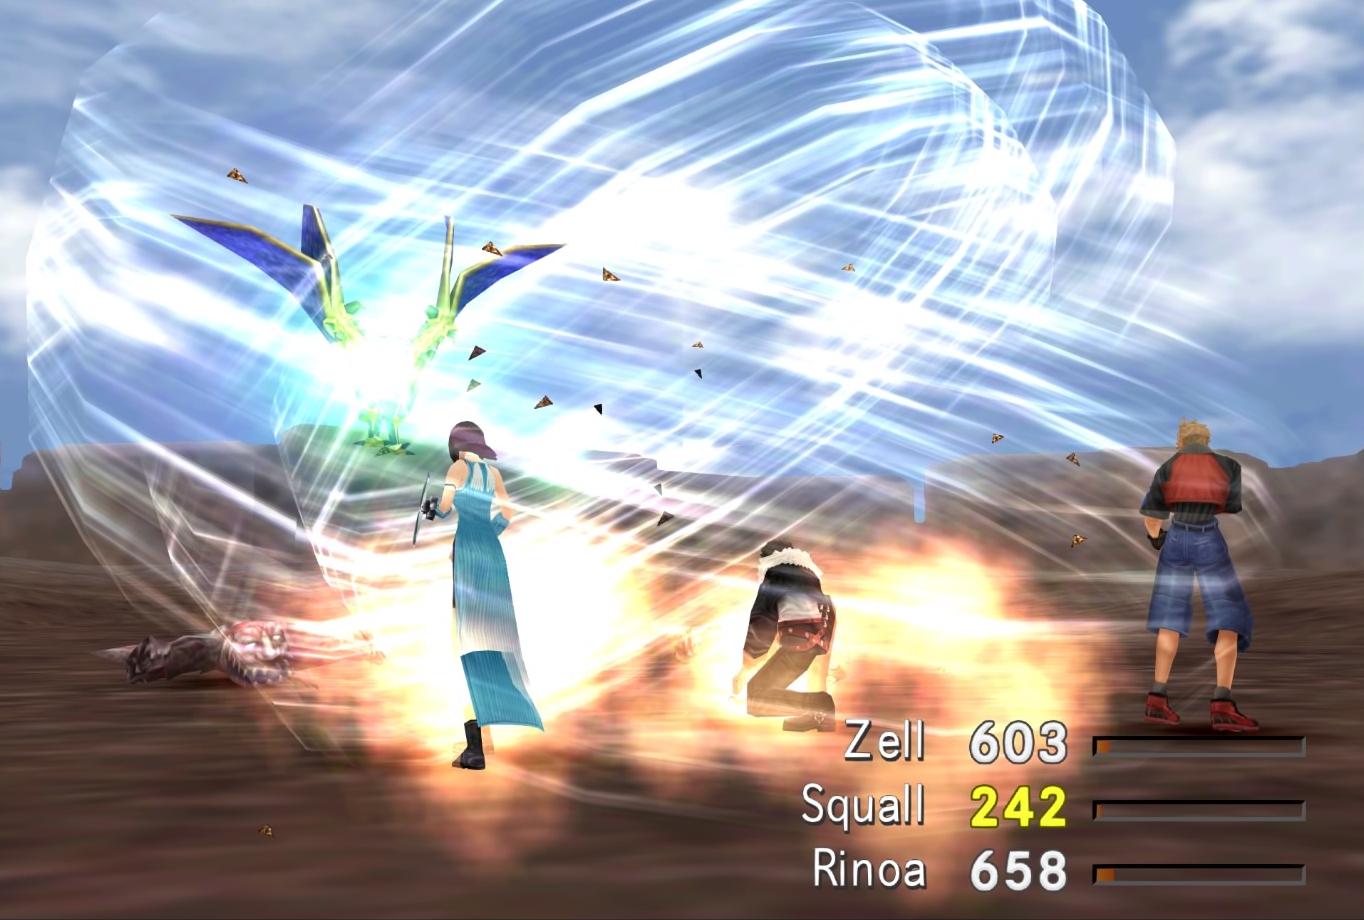 File:FFVIII Wind Blast.png